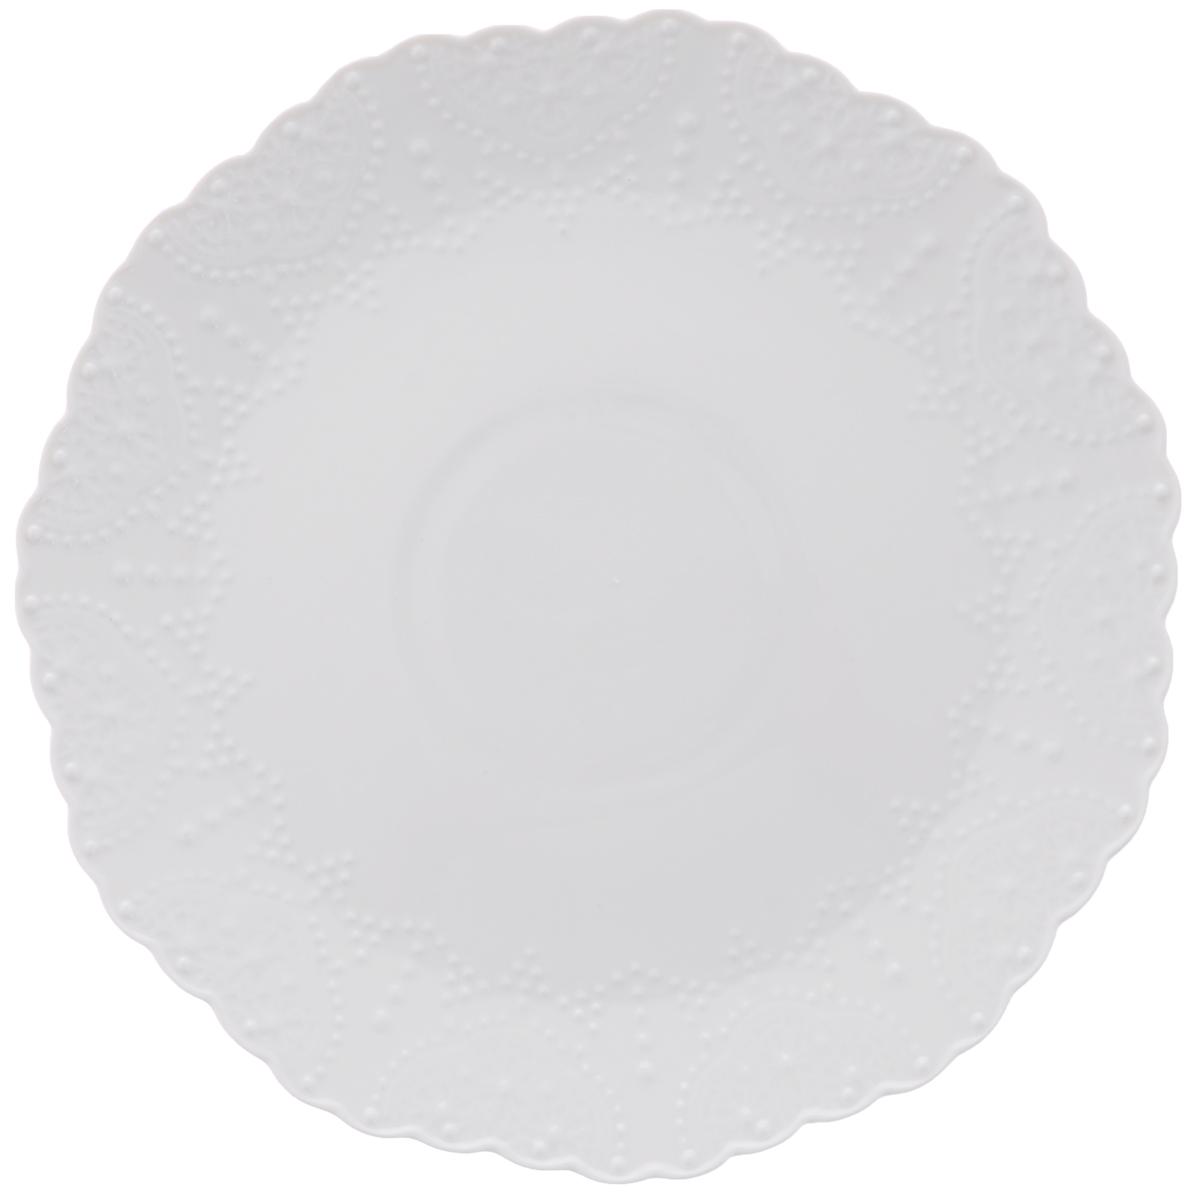 "Тарелка обеденная Walmer ""Vivien"", цвет: белый, диаметр 26 см"